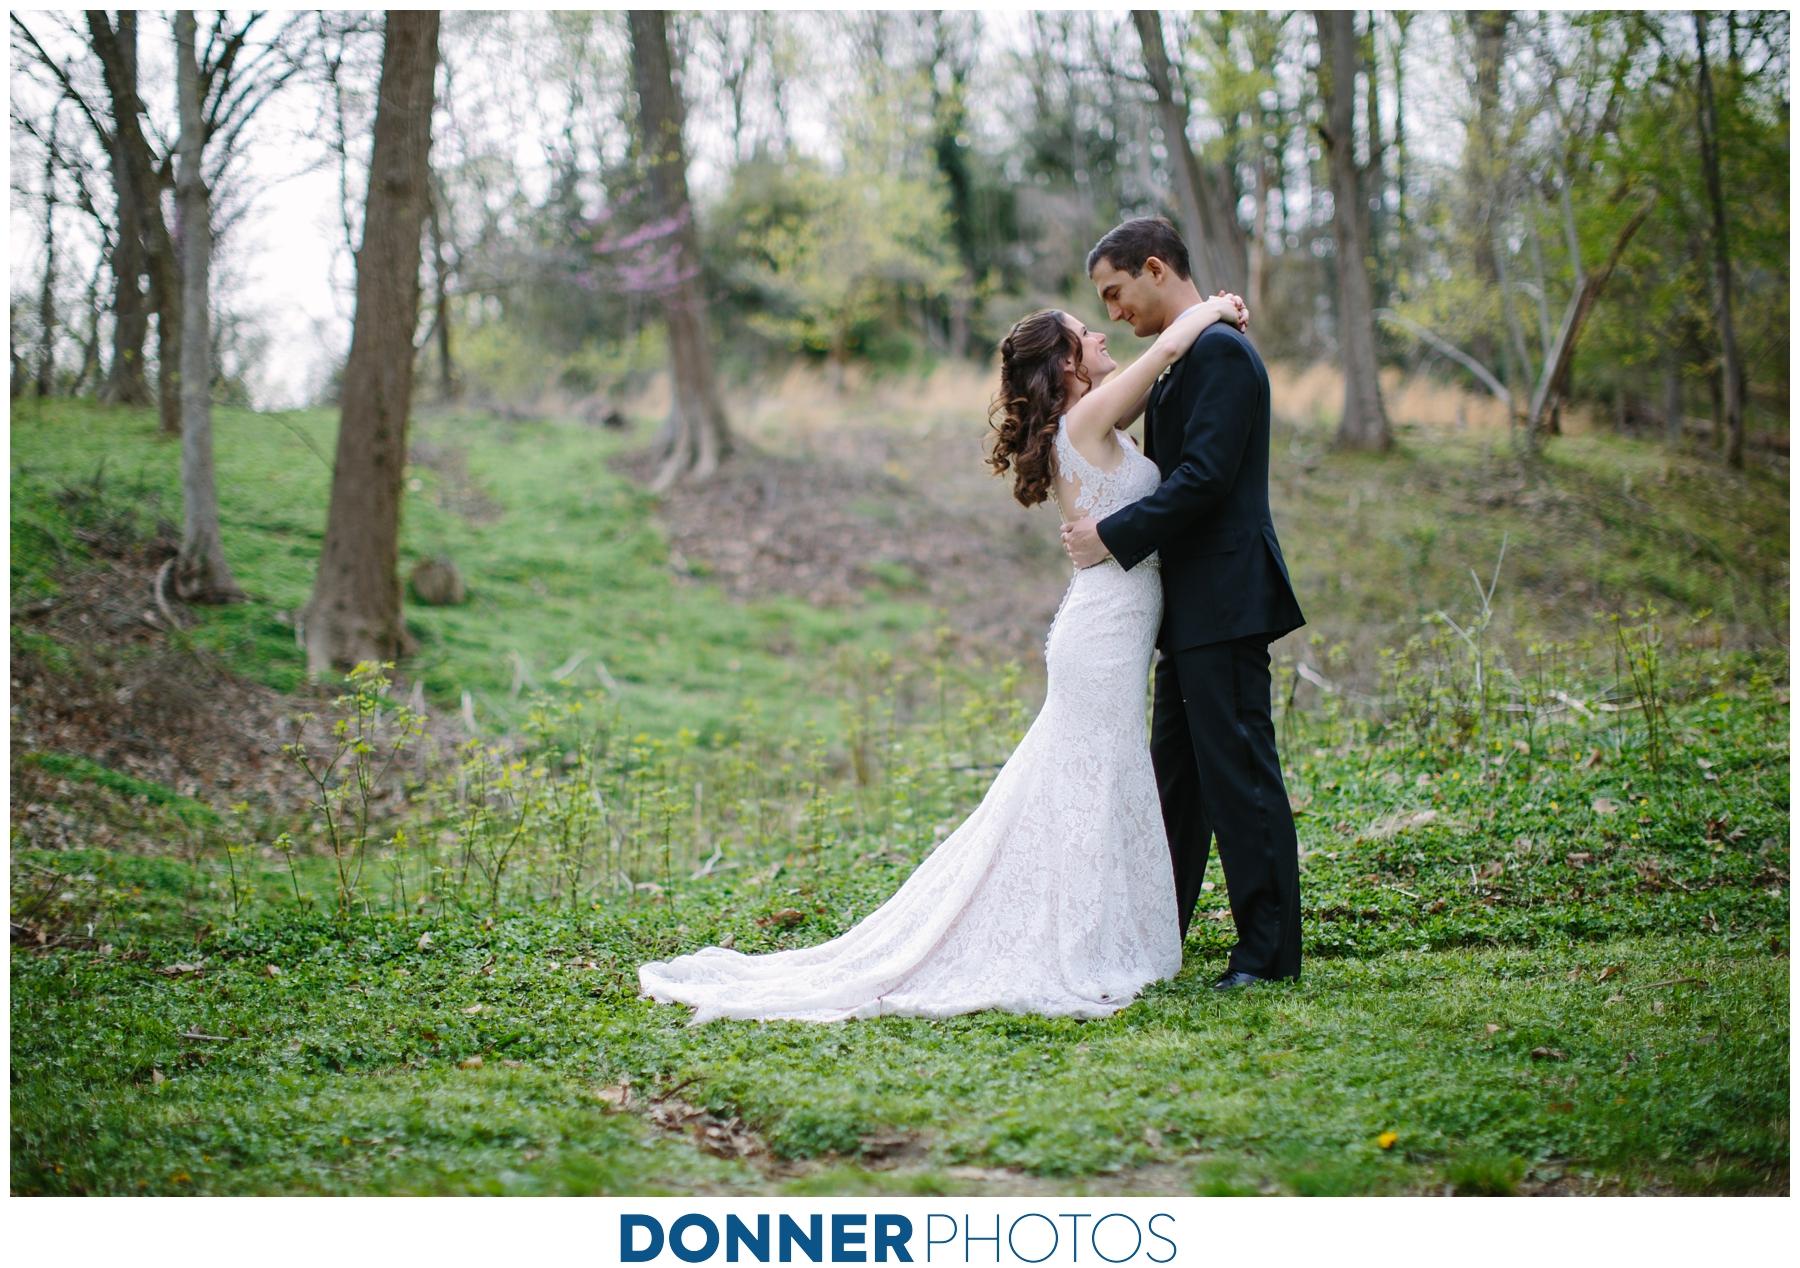 WASHINGTON DC WEDDING: ALLISON & MARK